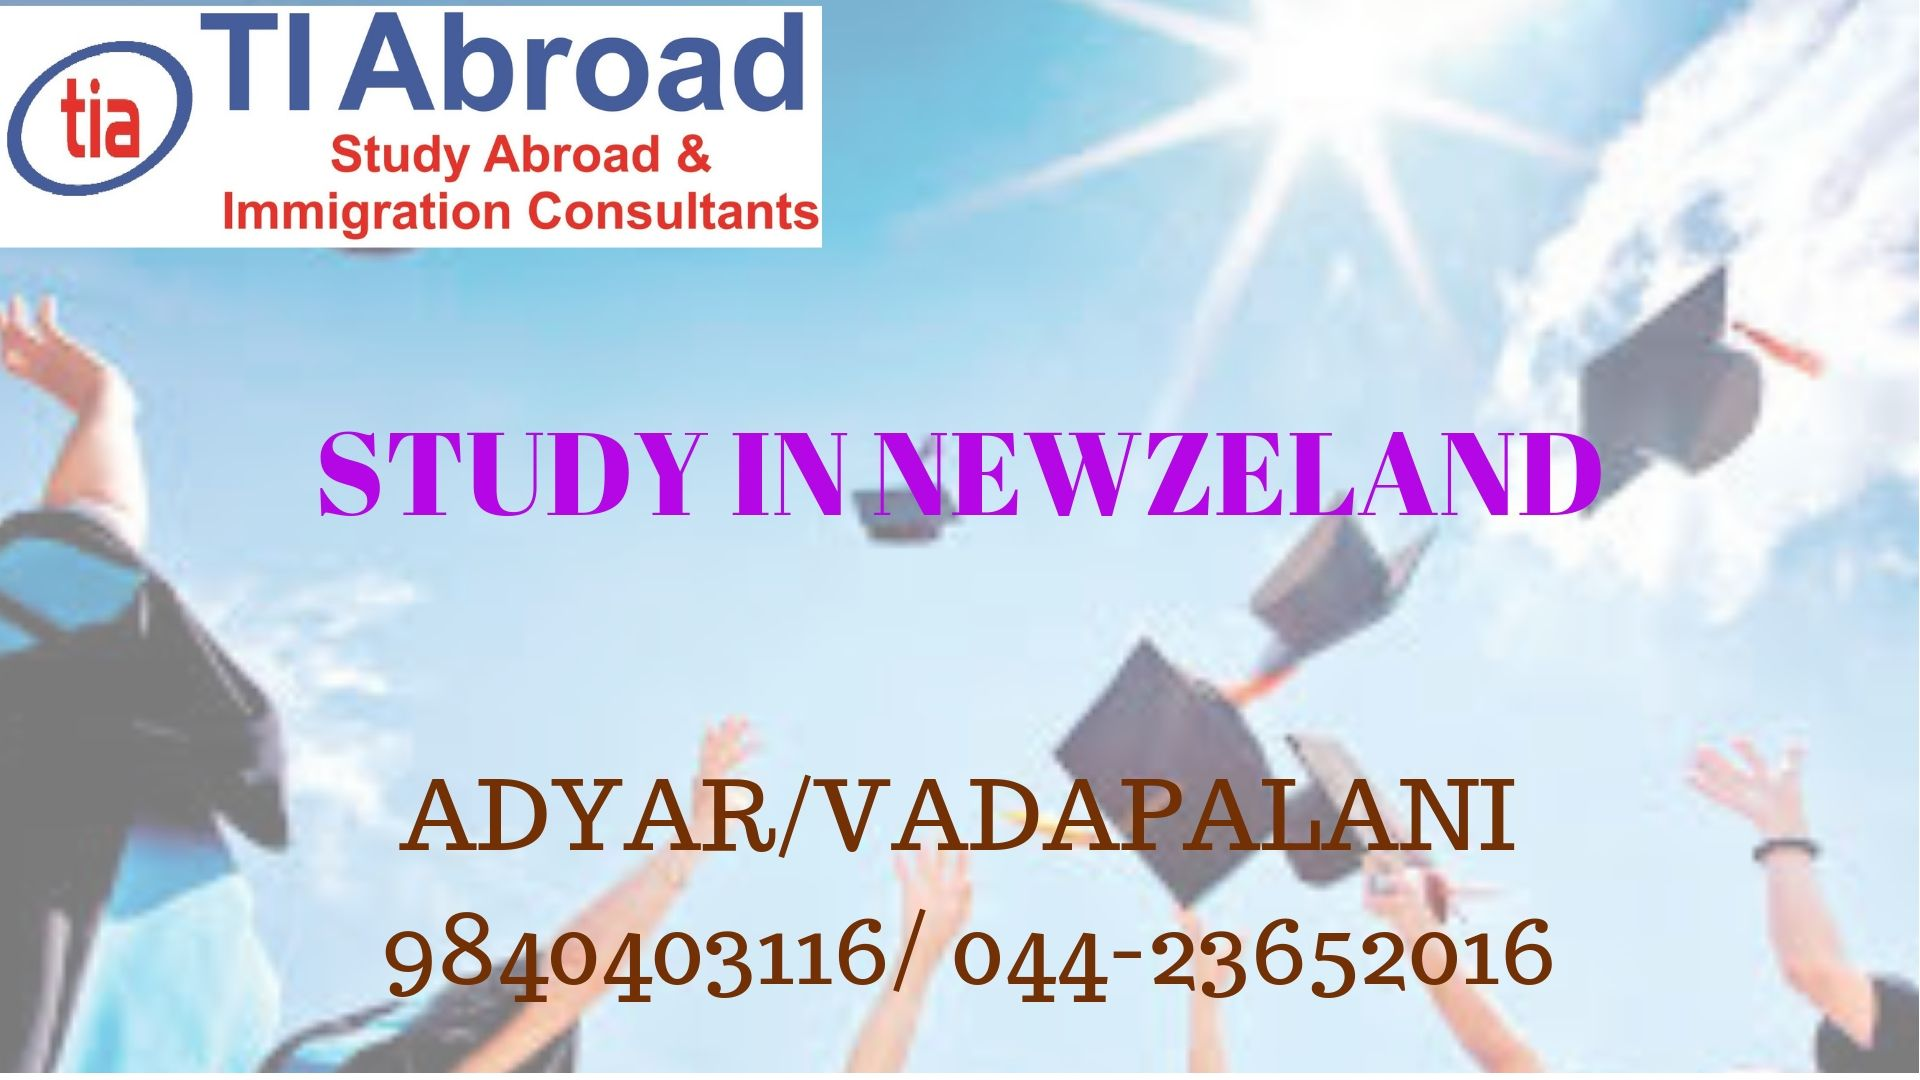 studyinnewzeland studyinabroad Ph 9840403116/044